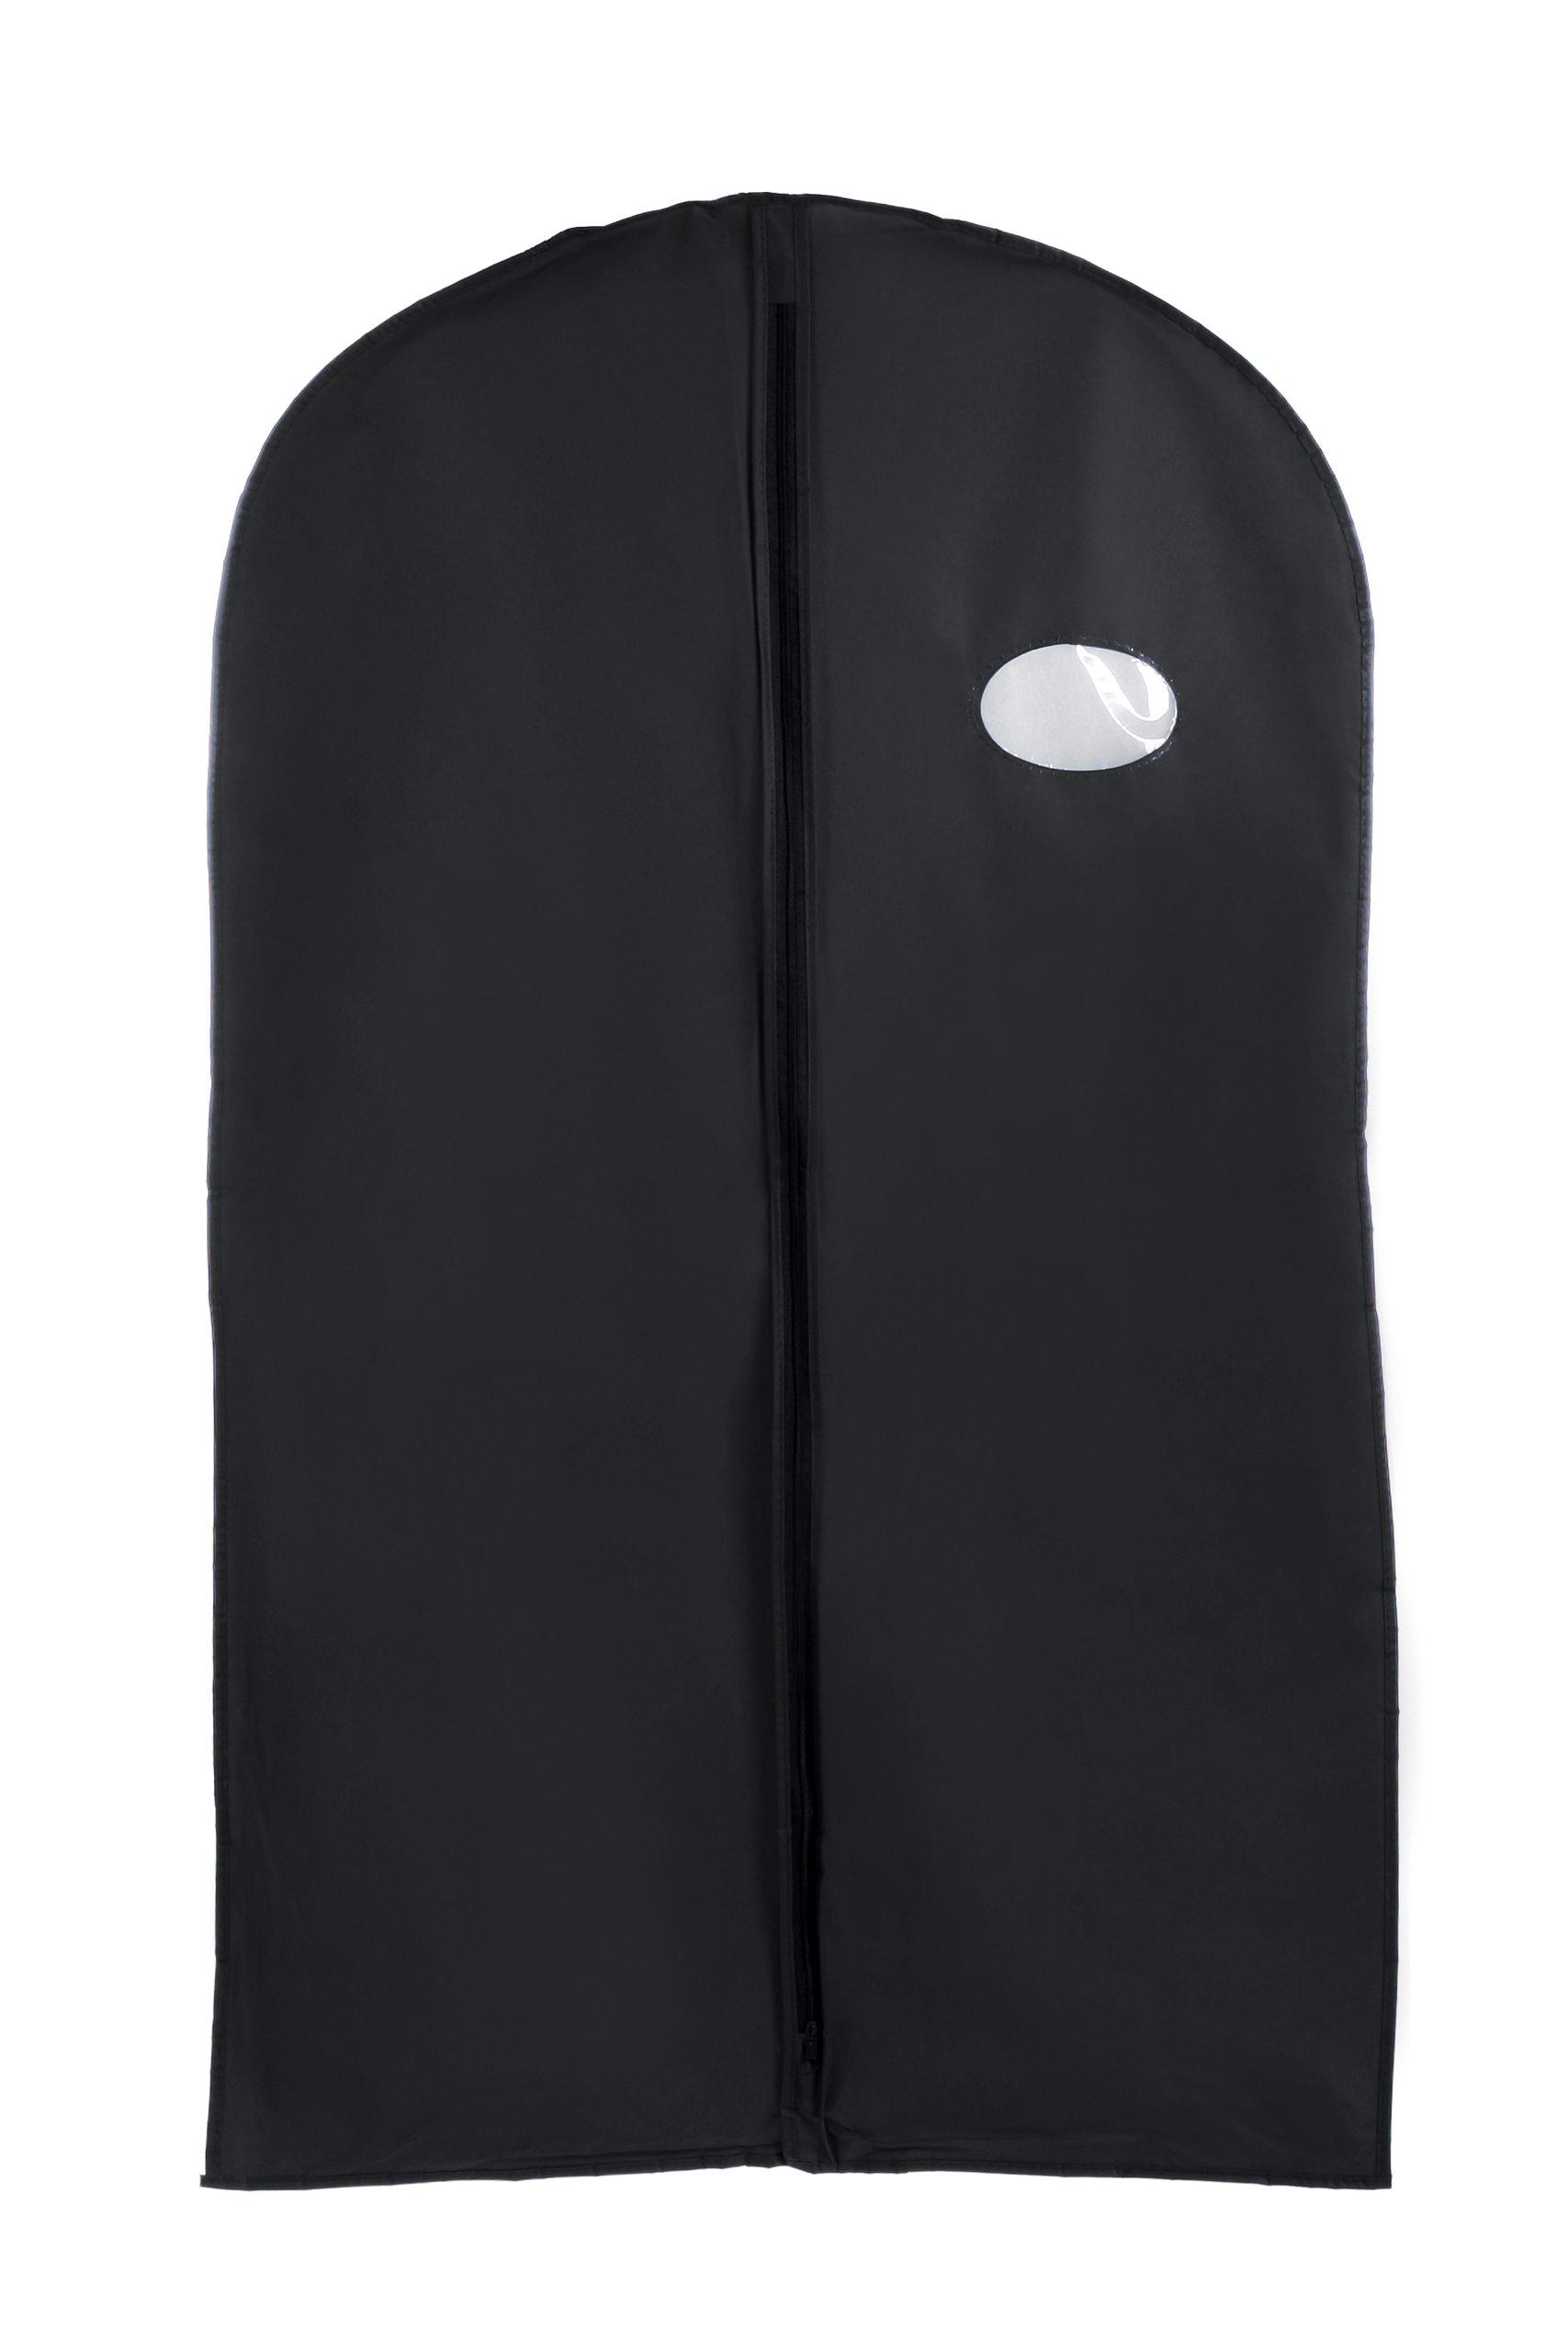 1e332566f025 Cheap Vinyl Garment Bags Wholesale, find Vinyl Garment Bags ...